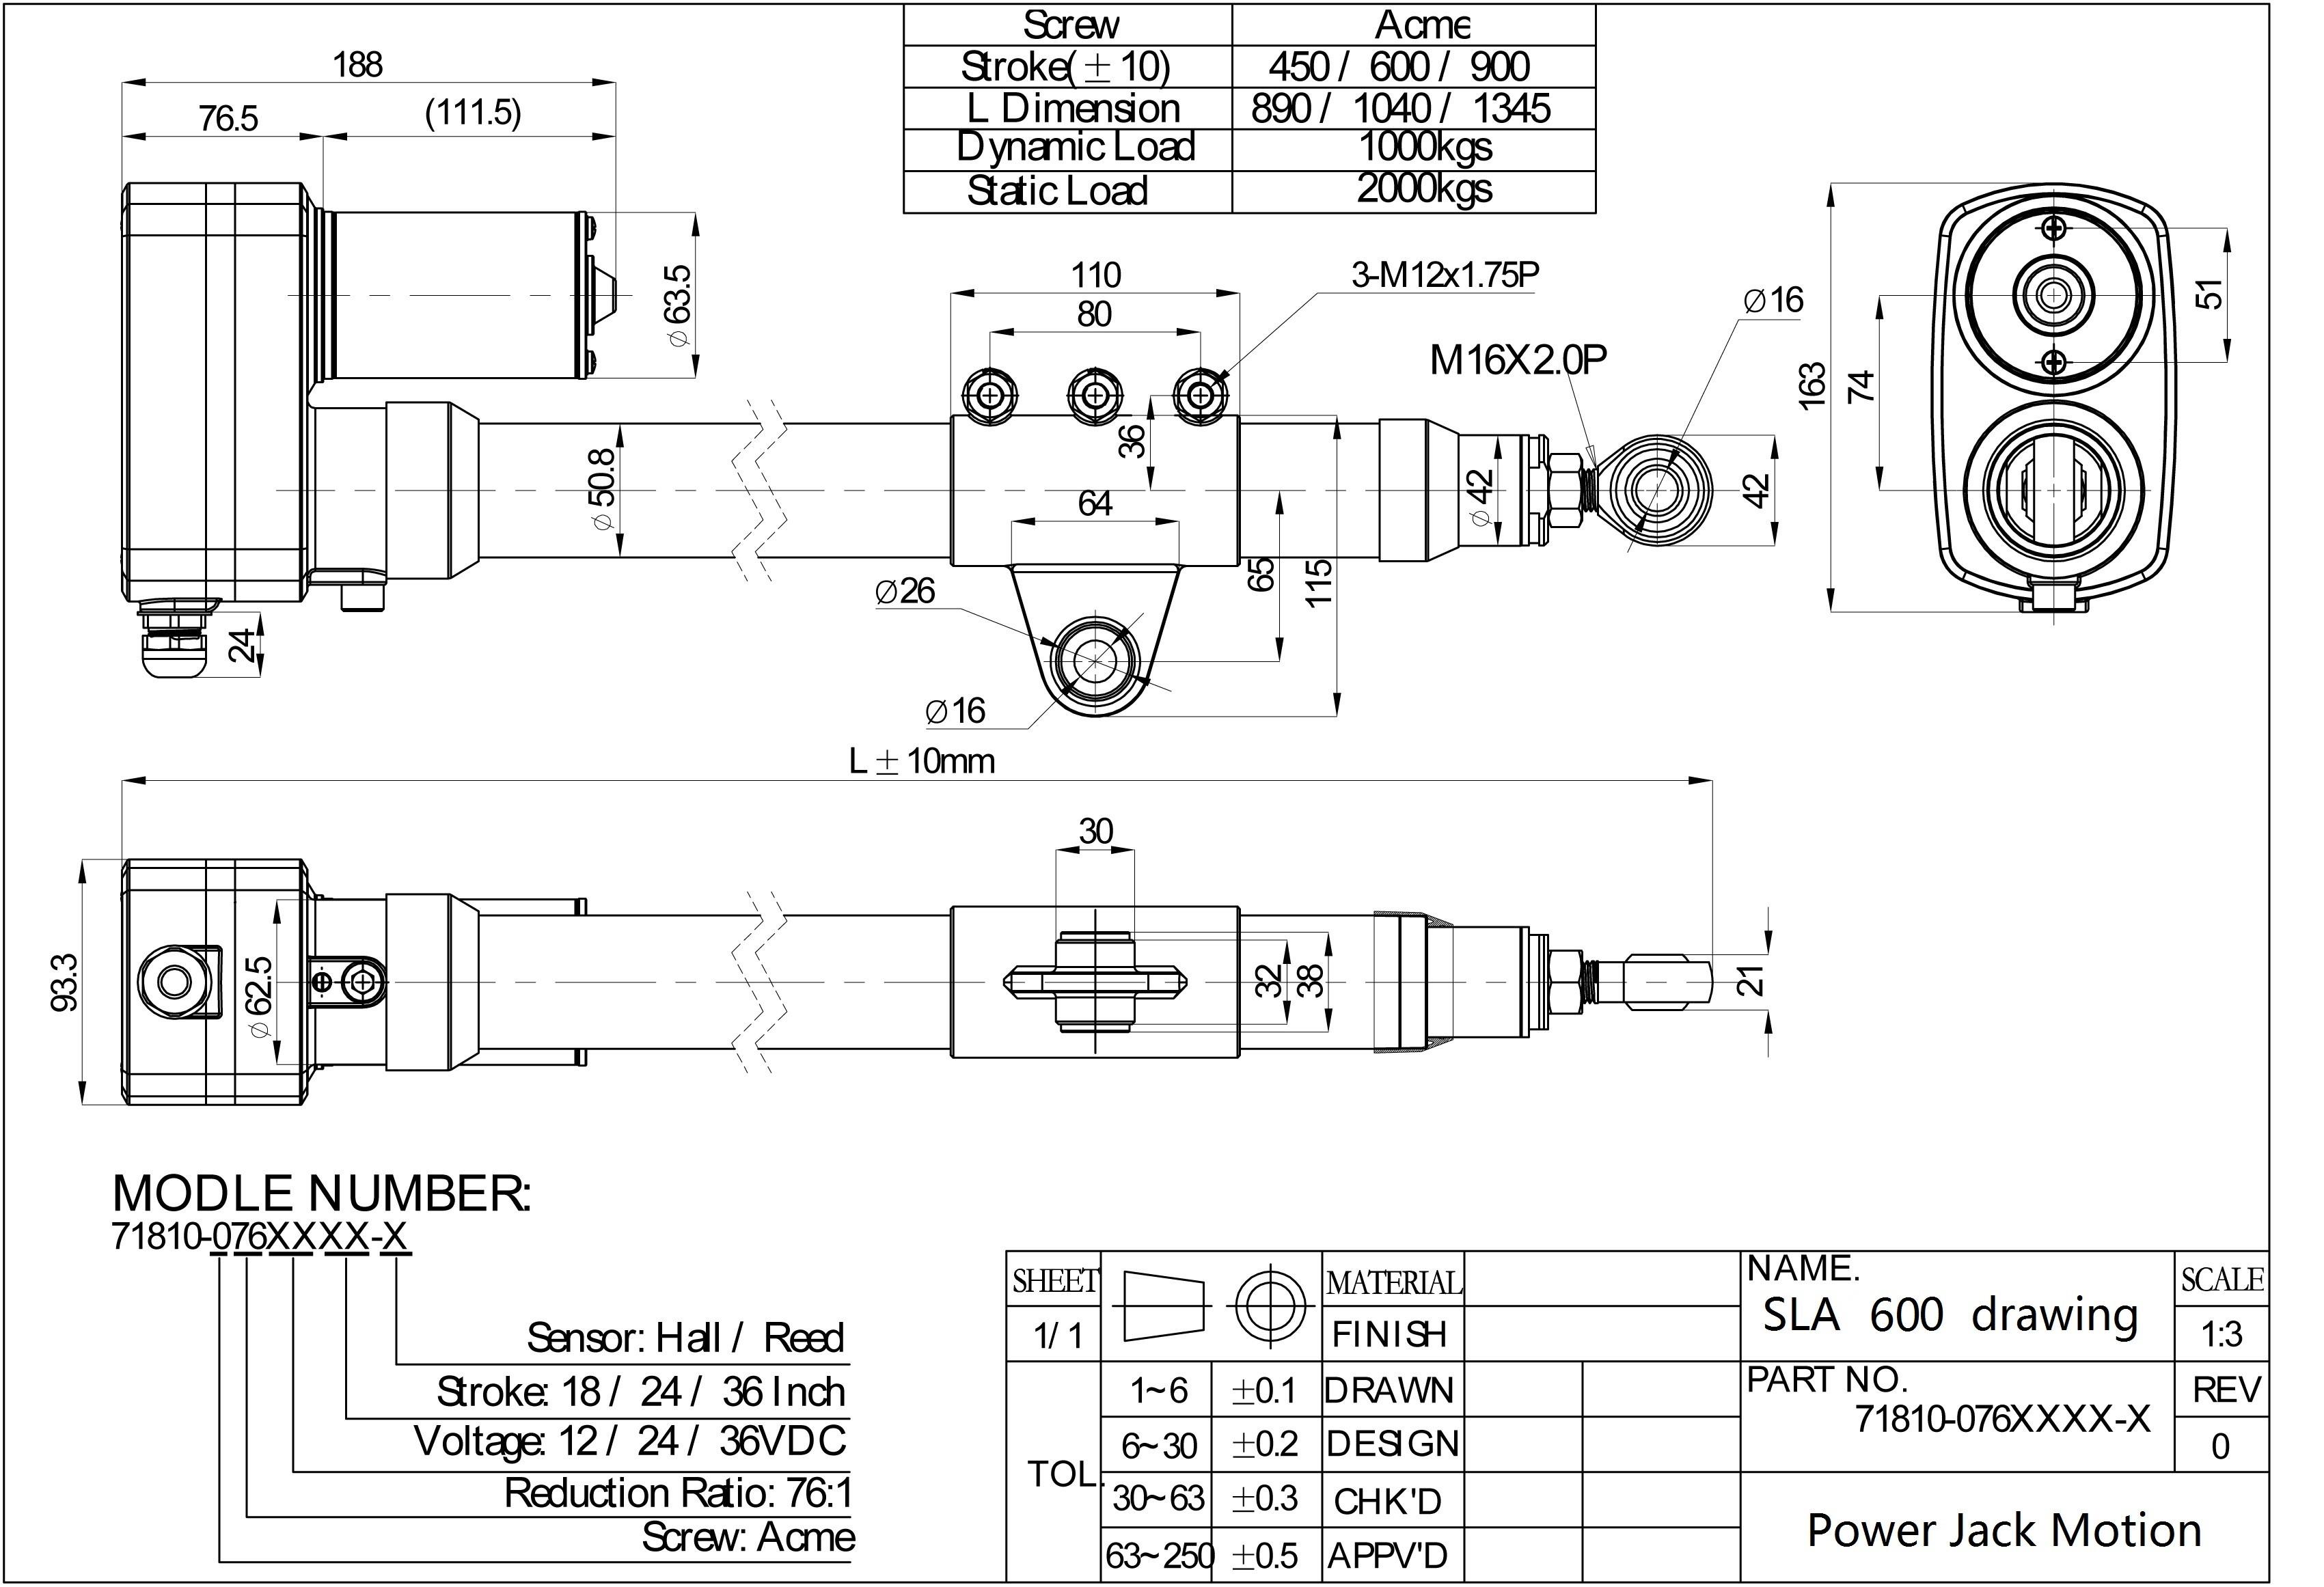 SLA600 solar tracking actuator drawing